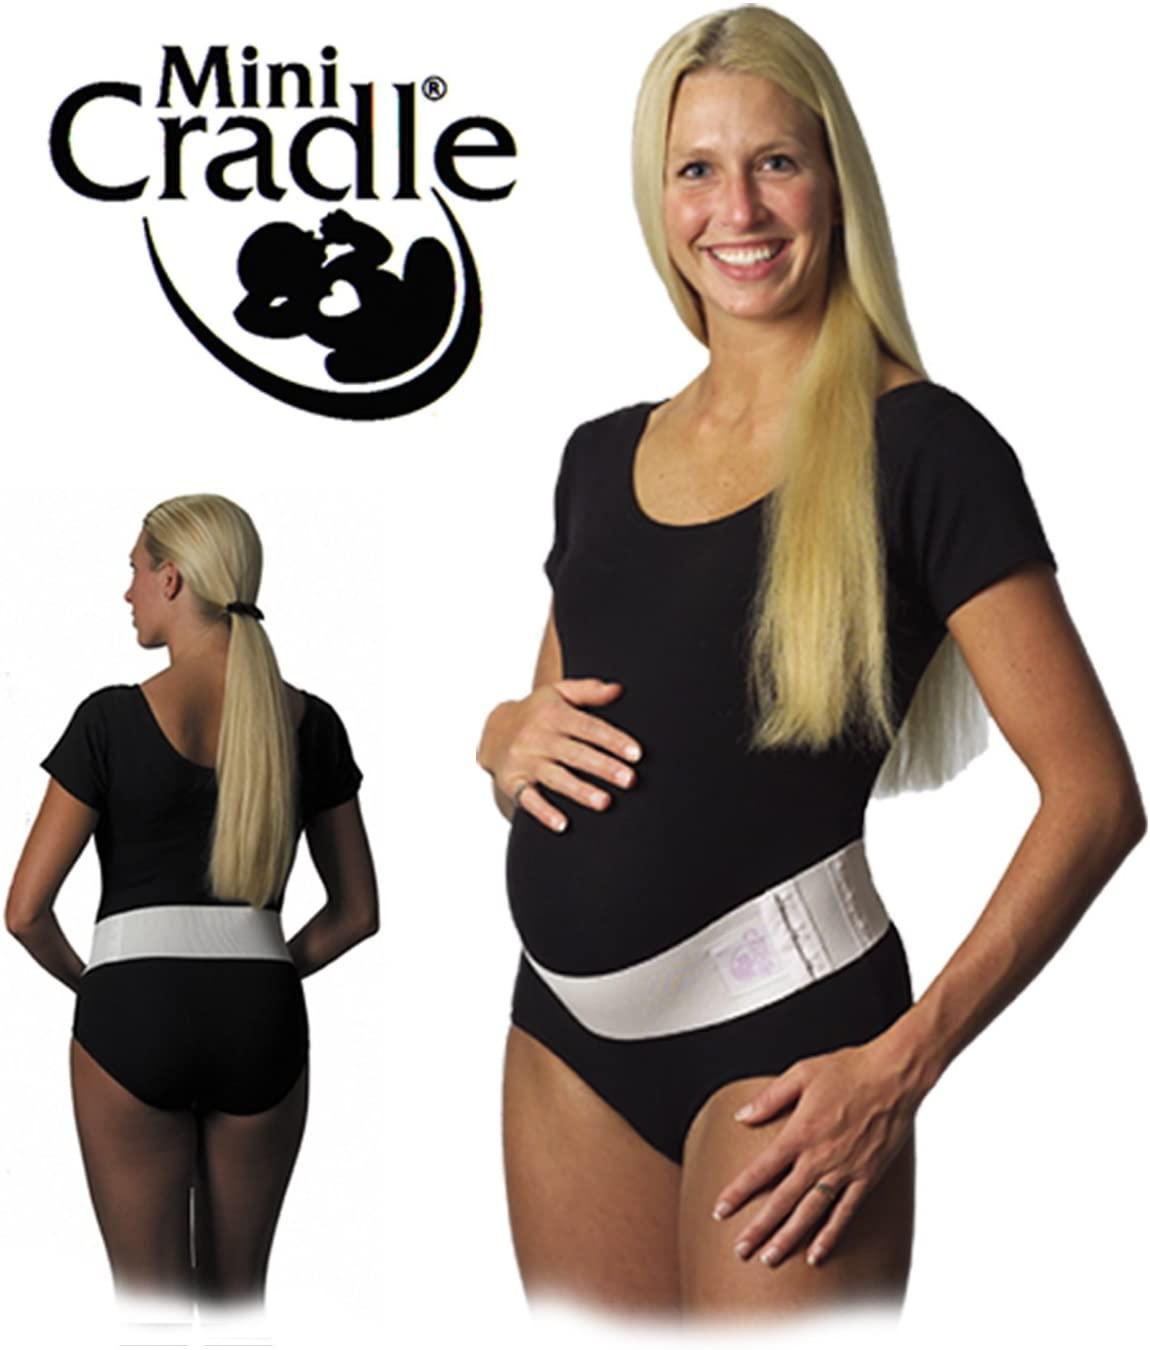 Prenatal Cradle Mini Cradle Small